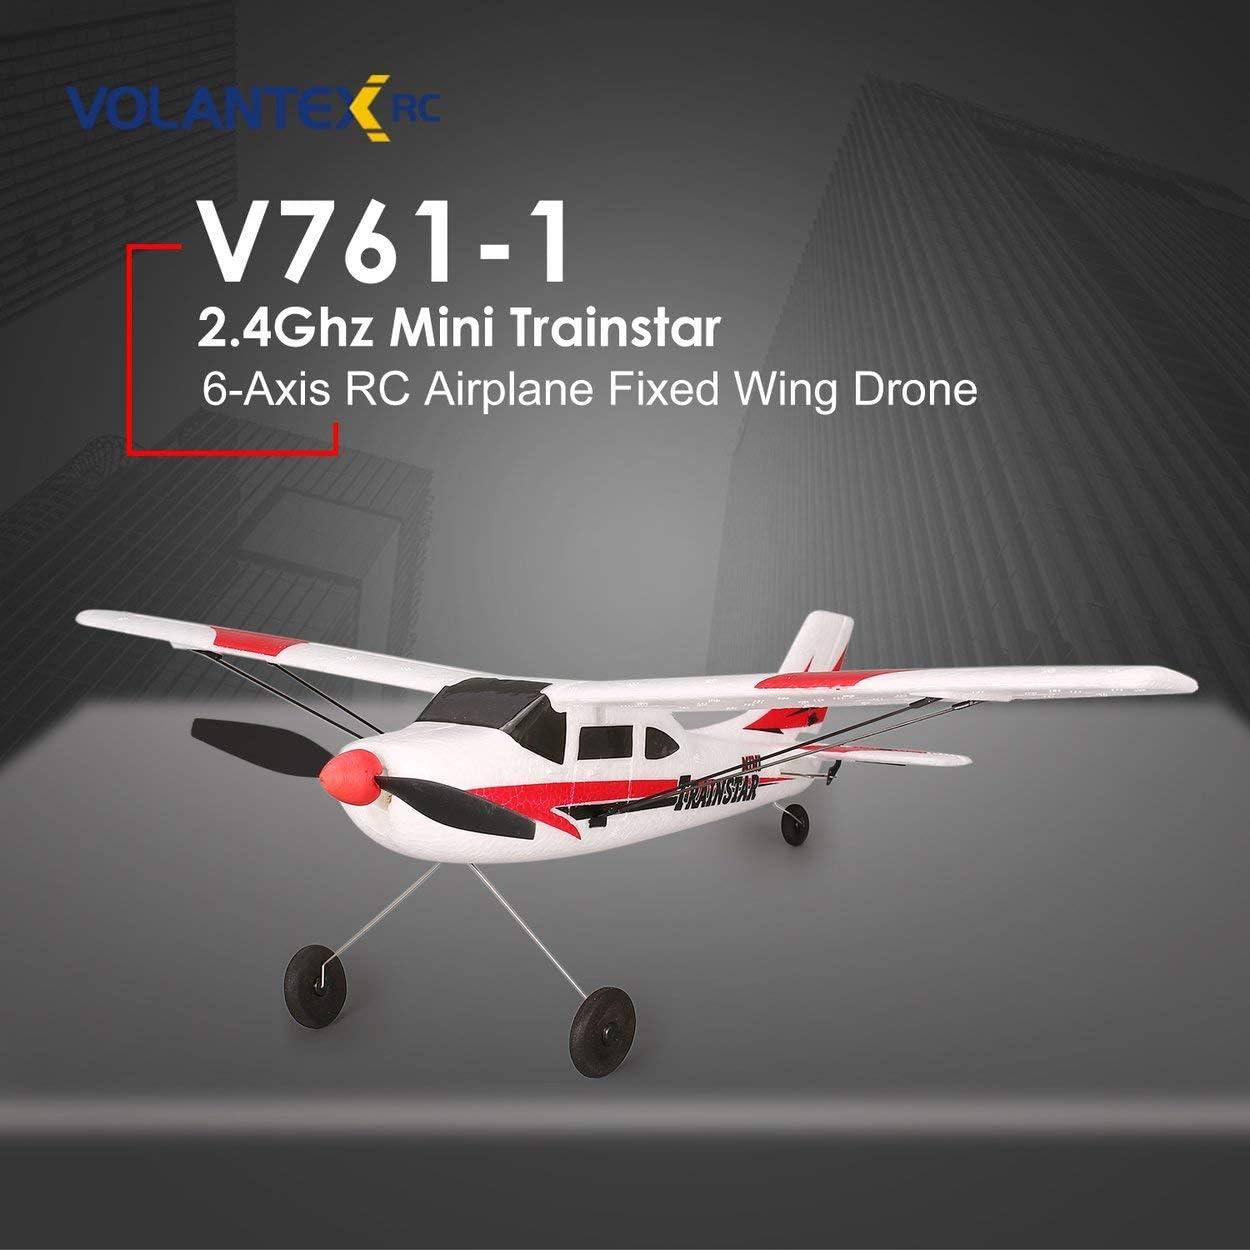 Lorenlli Fit VOLANTEX V761-1 2.4Ghz 3CH Mini Trainstar 6-Axis Remote Control RC Airplane Fixed Wing Drone Plane RTF for Kids Gift Present